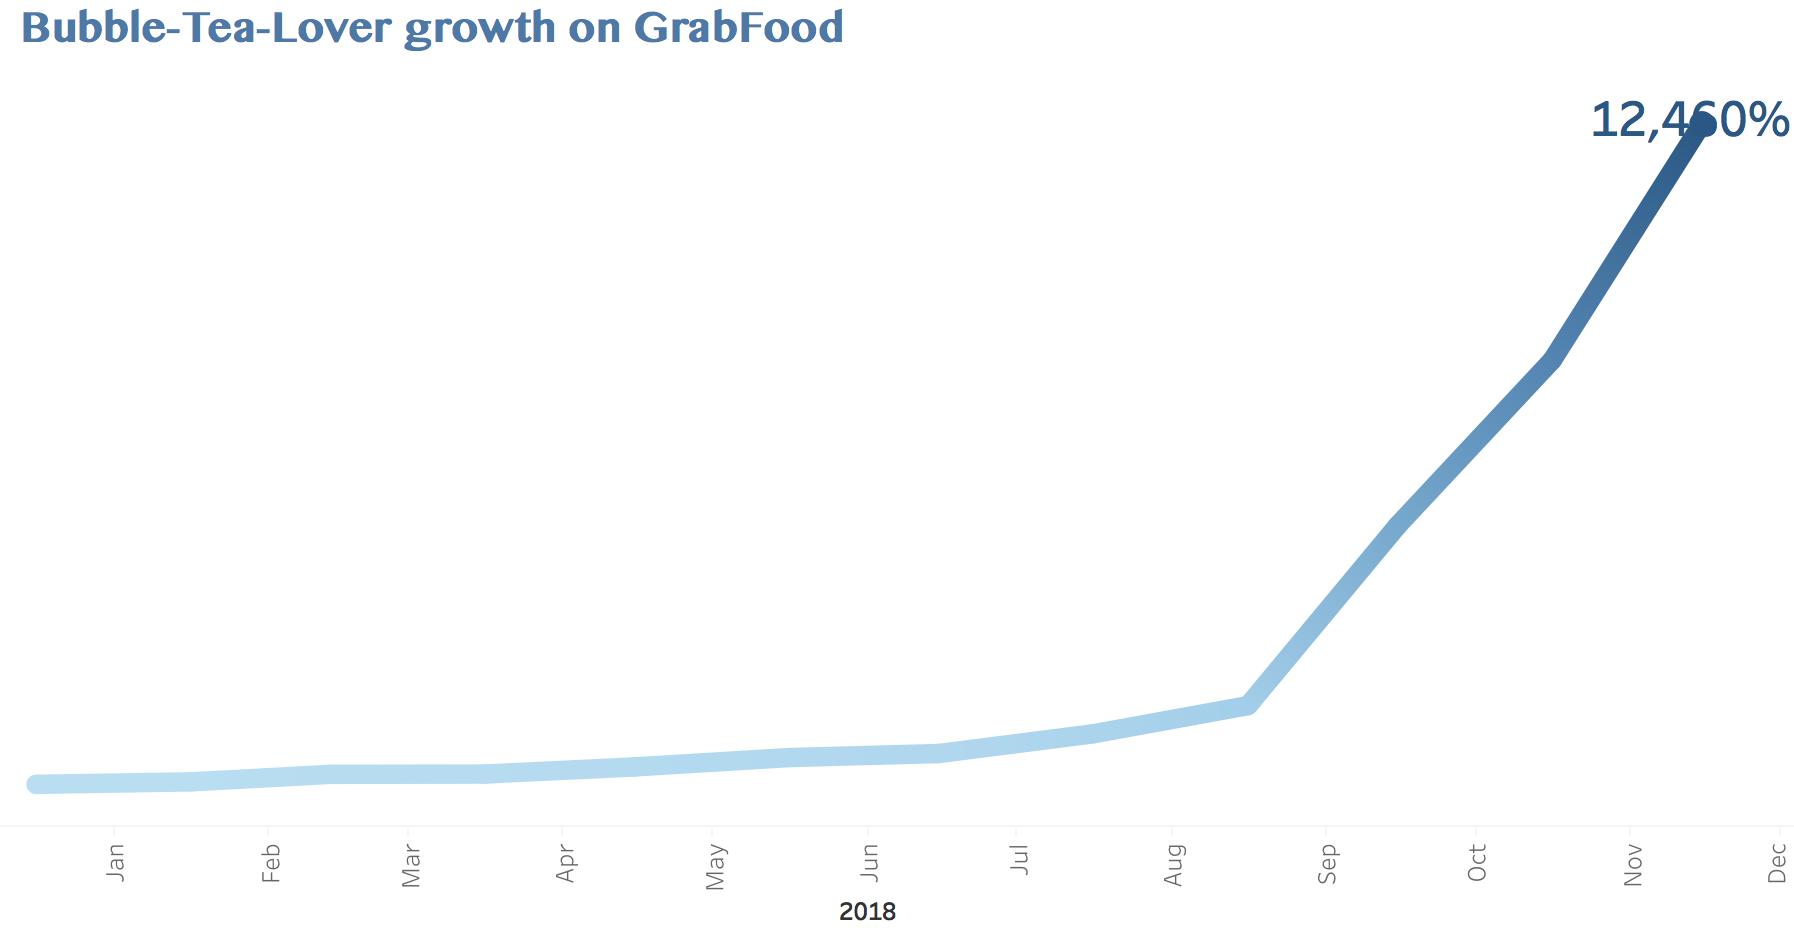 Bubble-Tea-Lover growth on GrabFood